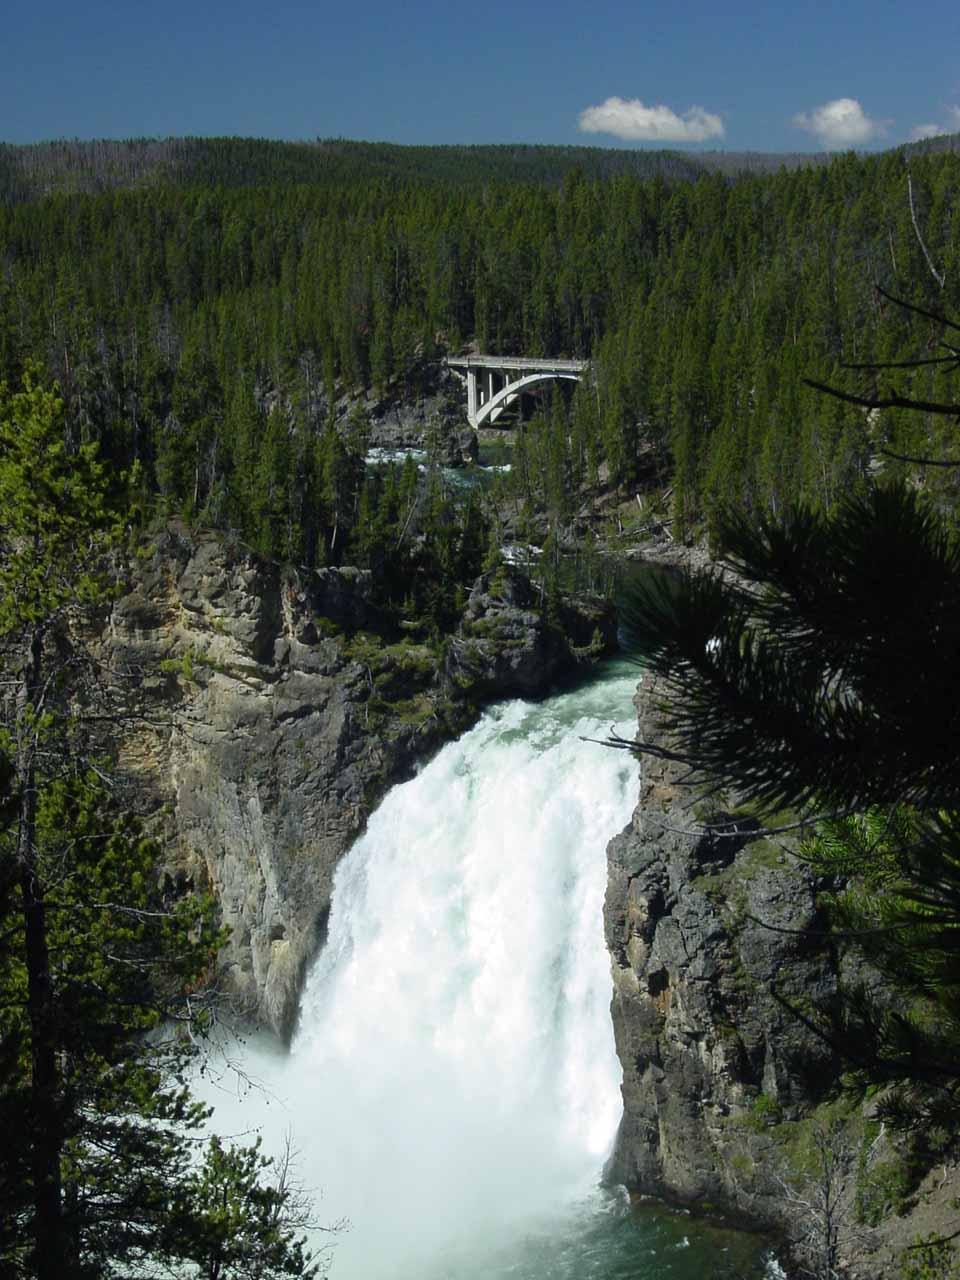 Upper Falls and the Chittenden Bridge